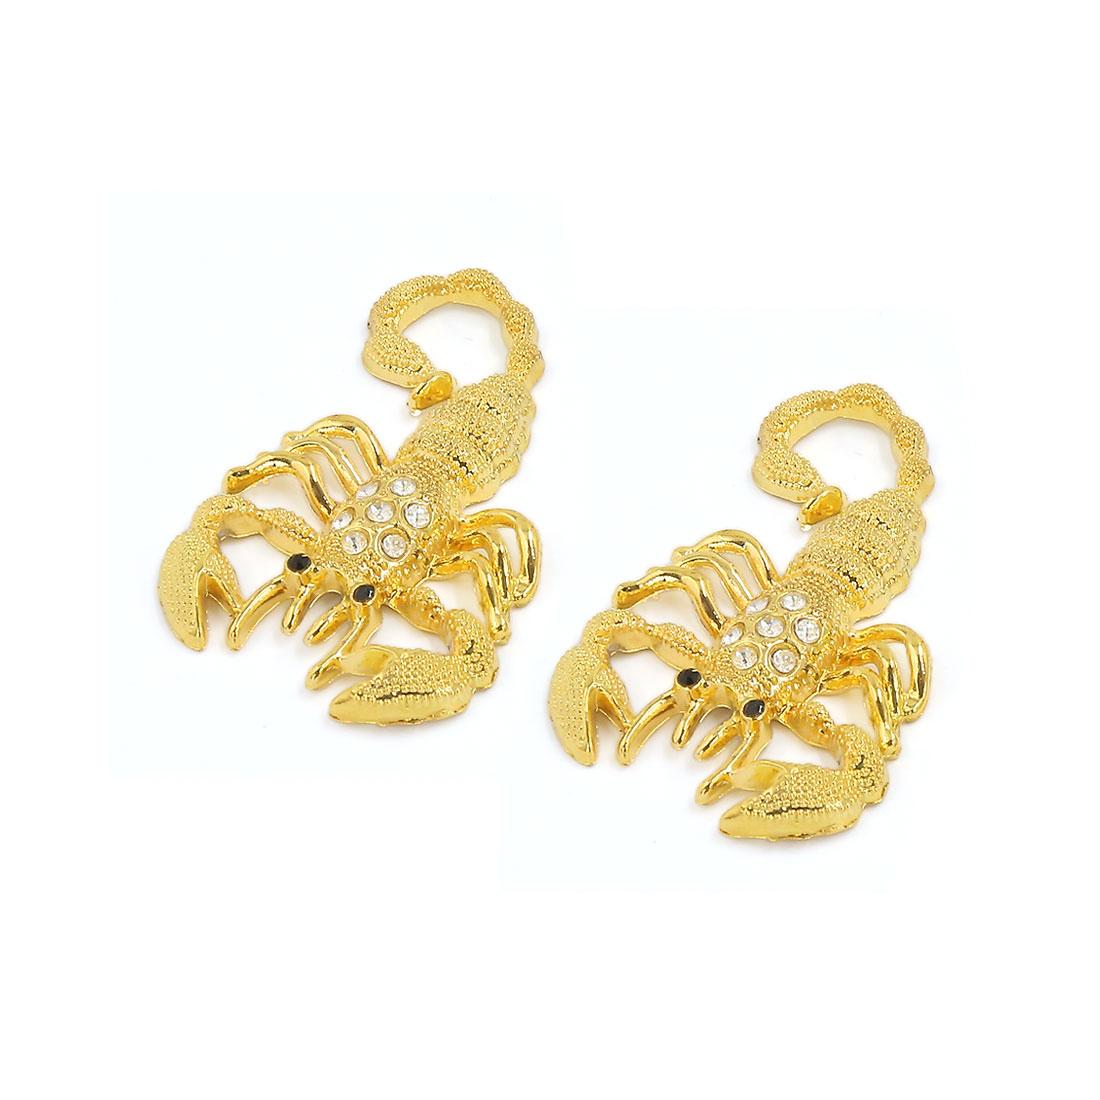 Gold Tone Metal 3D Faux Crystal Decor Scorpion Shape Adhesive Sticker Decal 2pcs